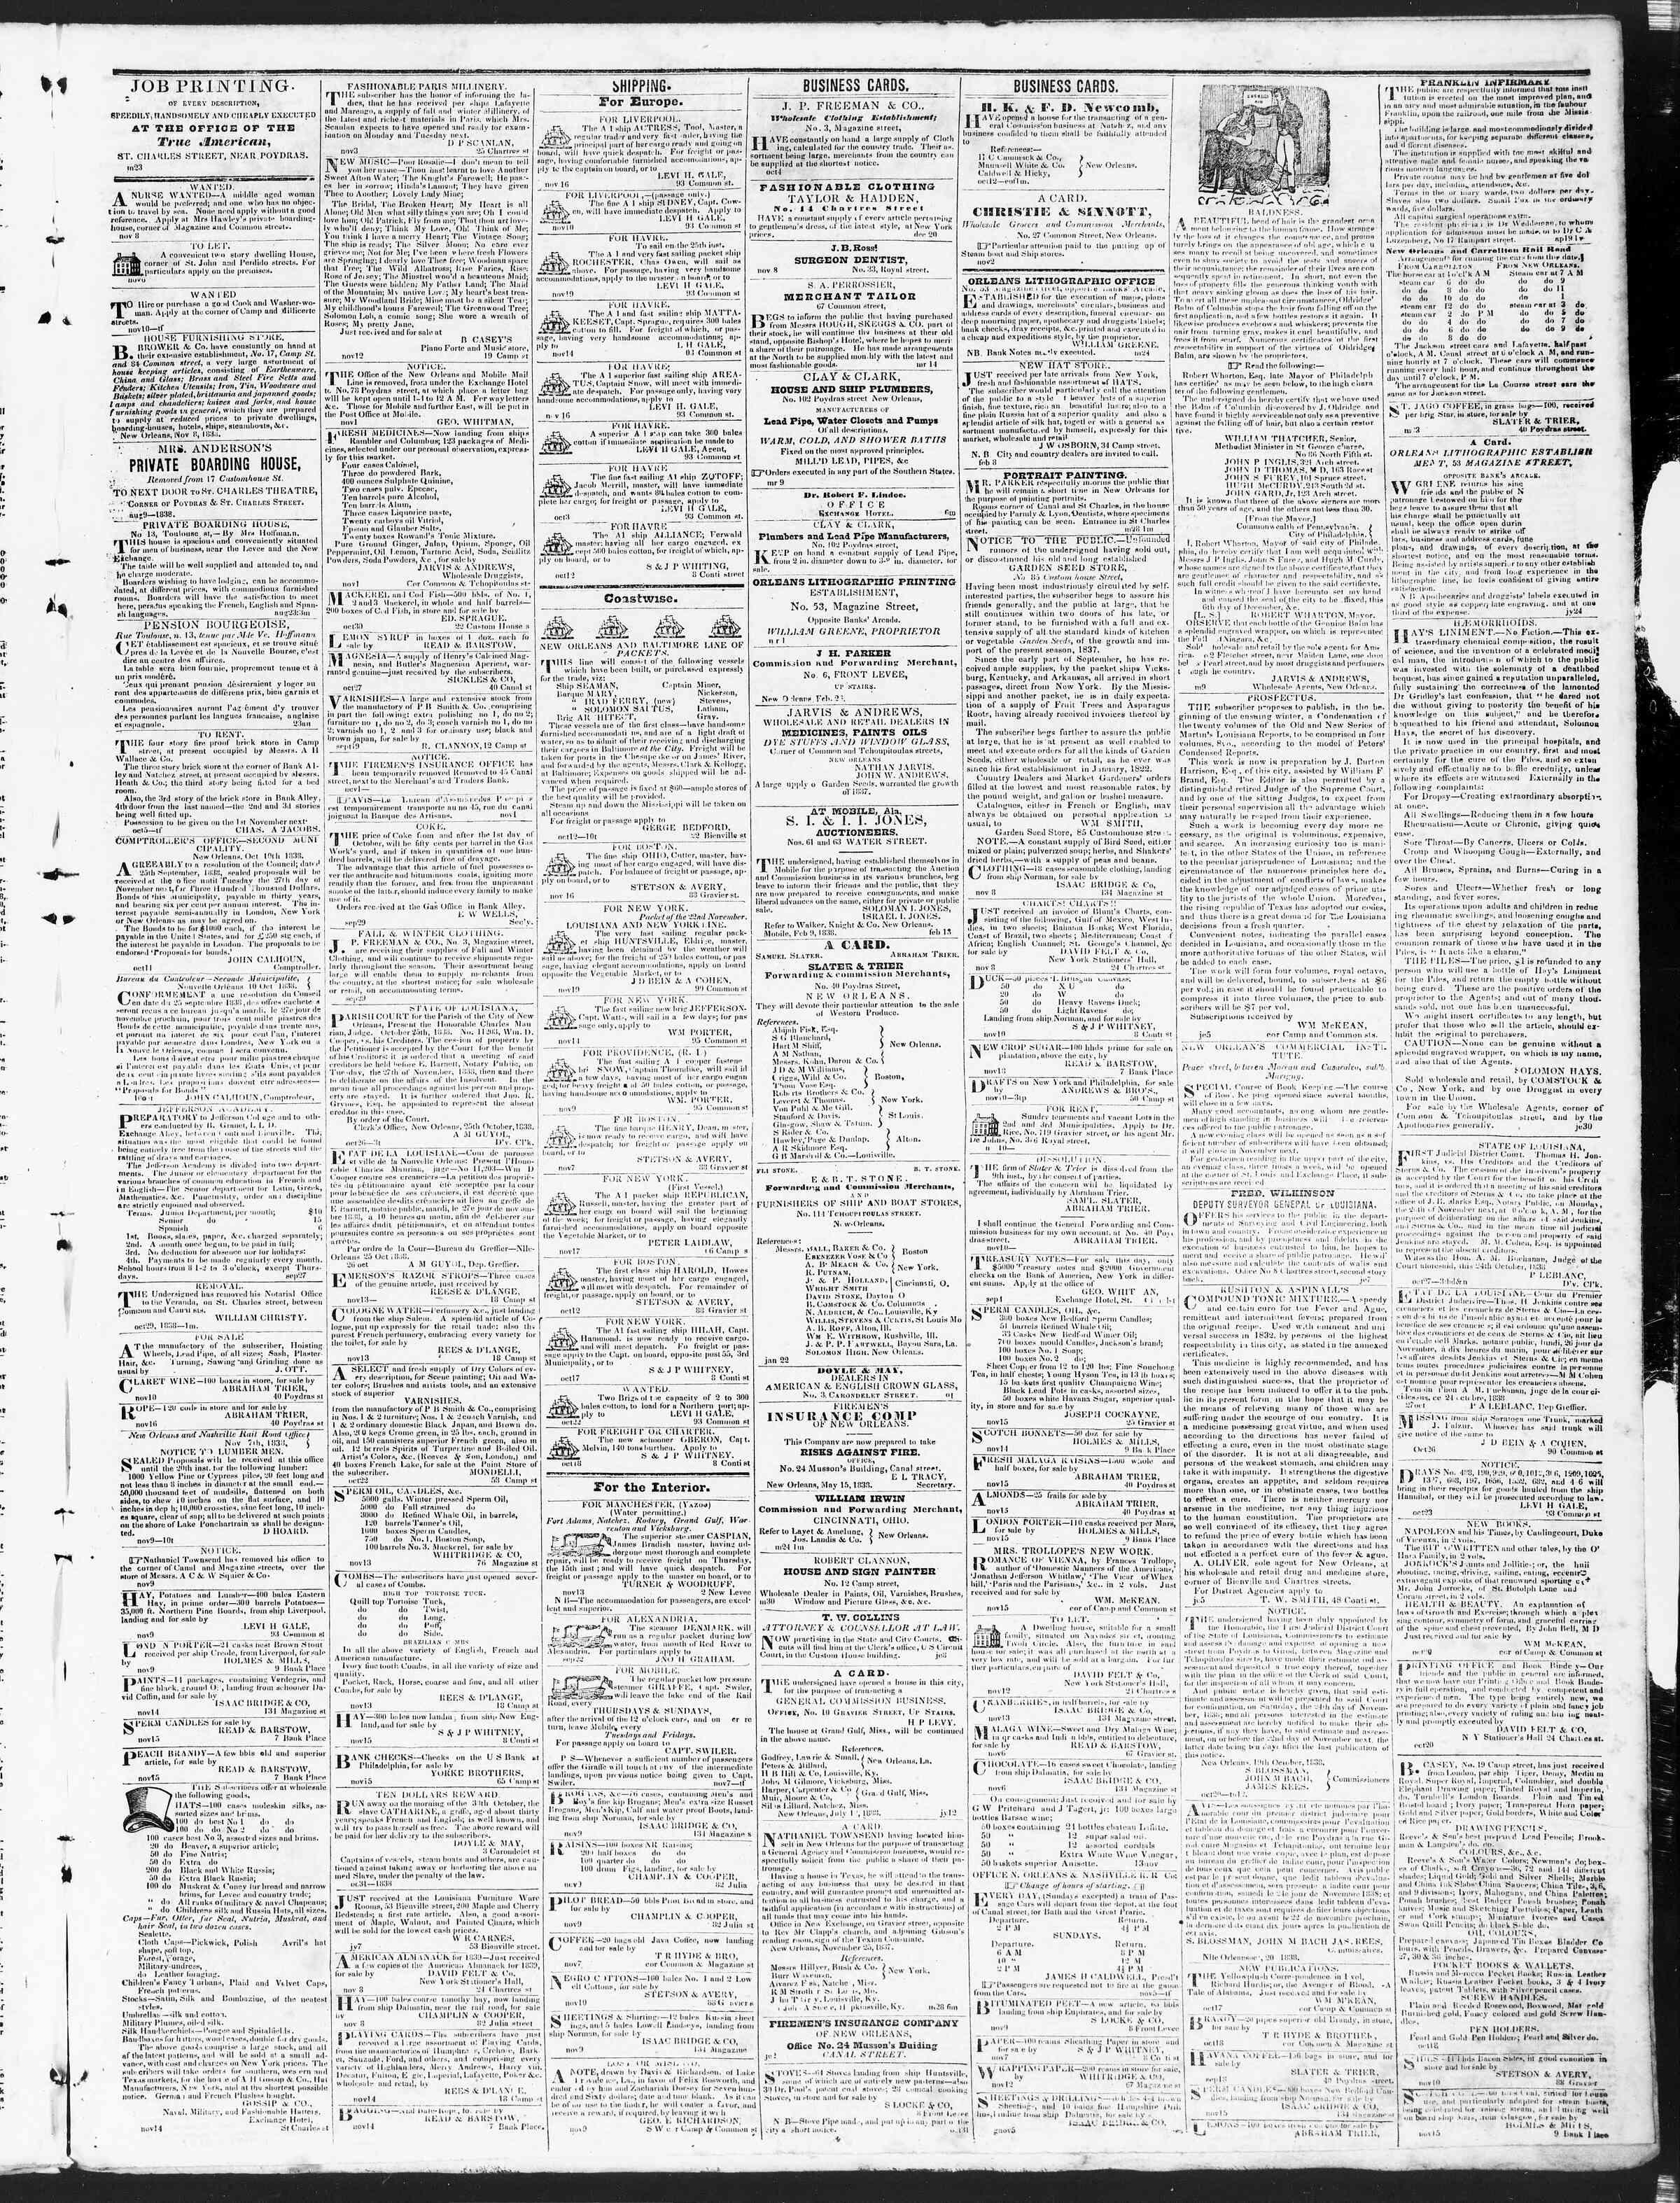 November 19, 1838 Tarihli True American Gazetesi Sayfa 3